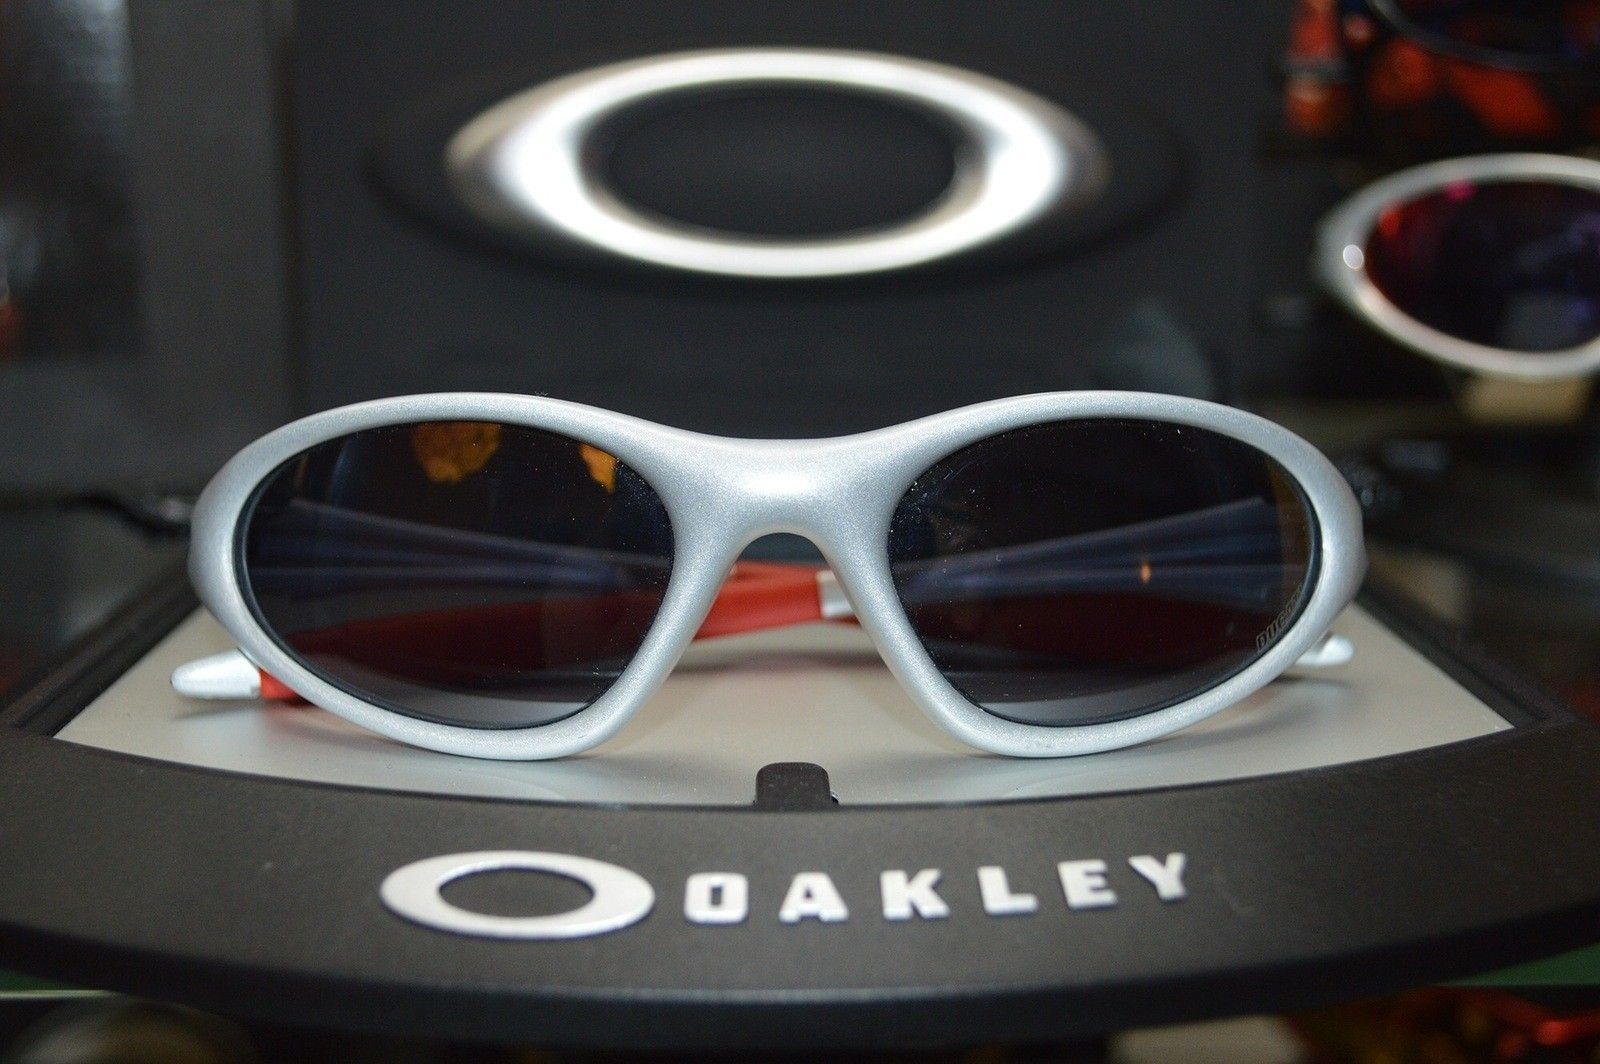 786cee0fc5 Oakley Scar Sunglasses Butterscotch gold Iridium